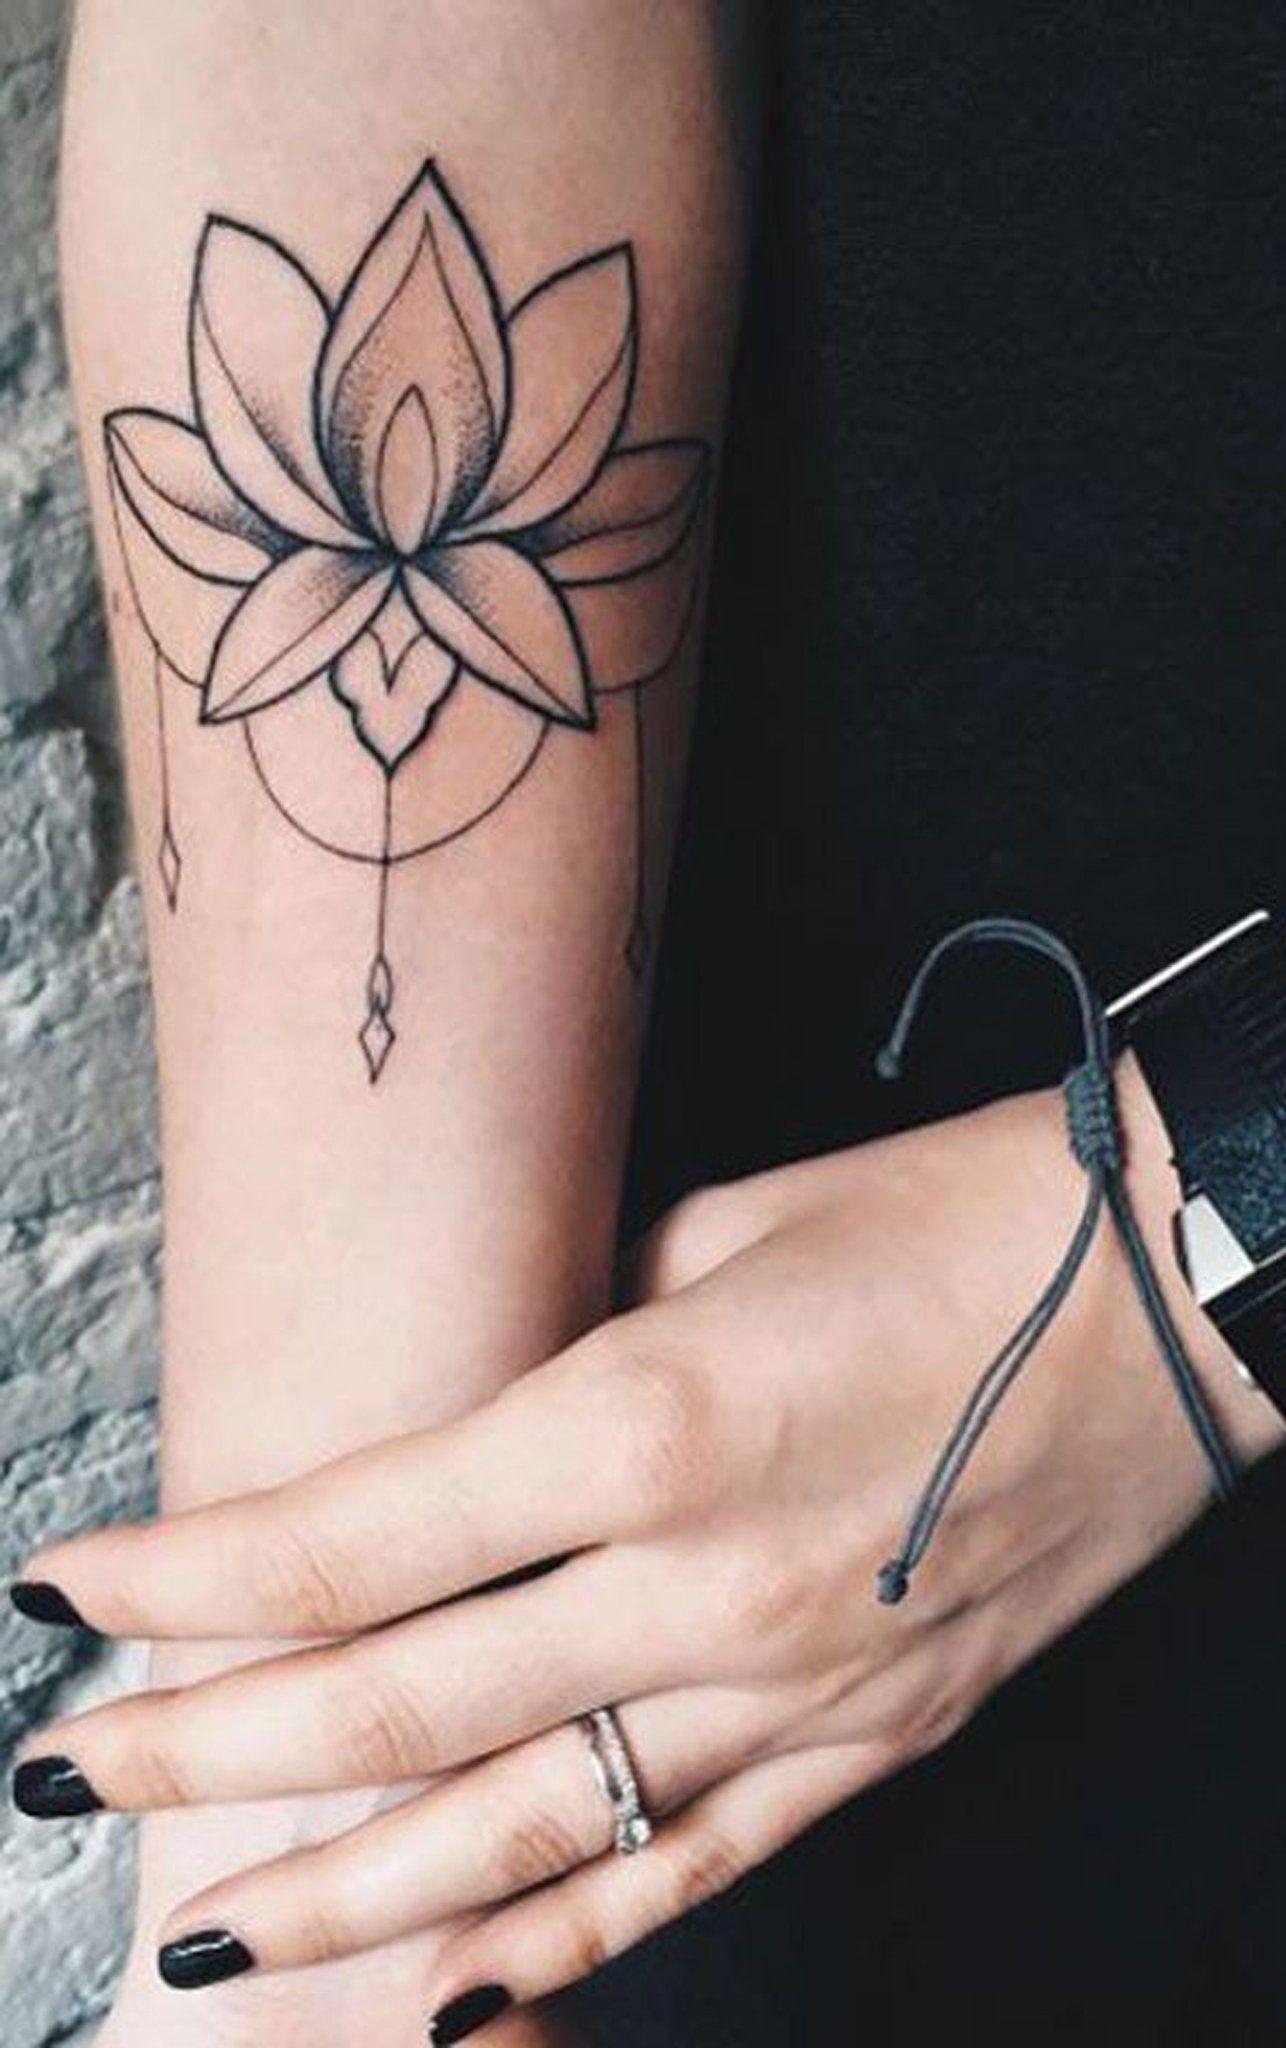 Black And White Lotus Chandelier Forearm Tattoo Ideas For Women Tribal Bohemian Boho Chic Lily Flower Forearm Tattoo Tattoos For Women Unique Forearm Tattoos